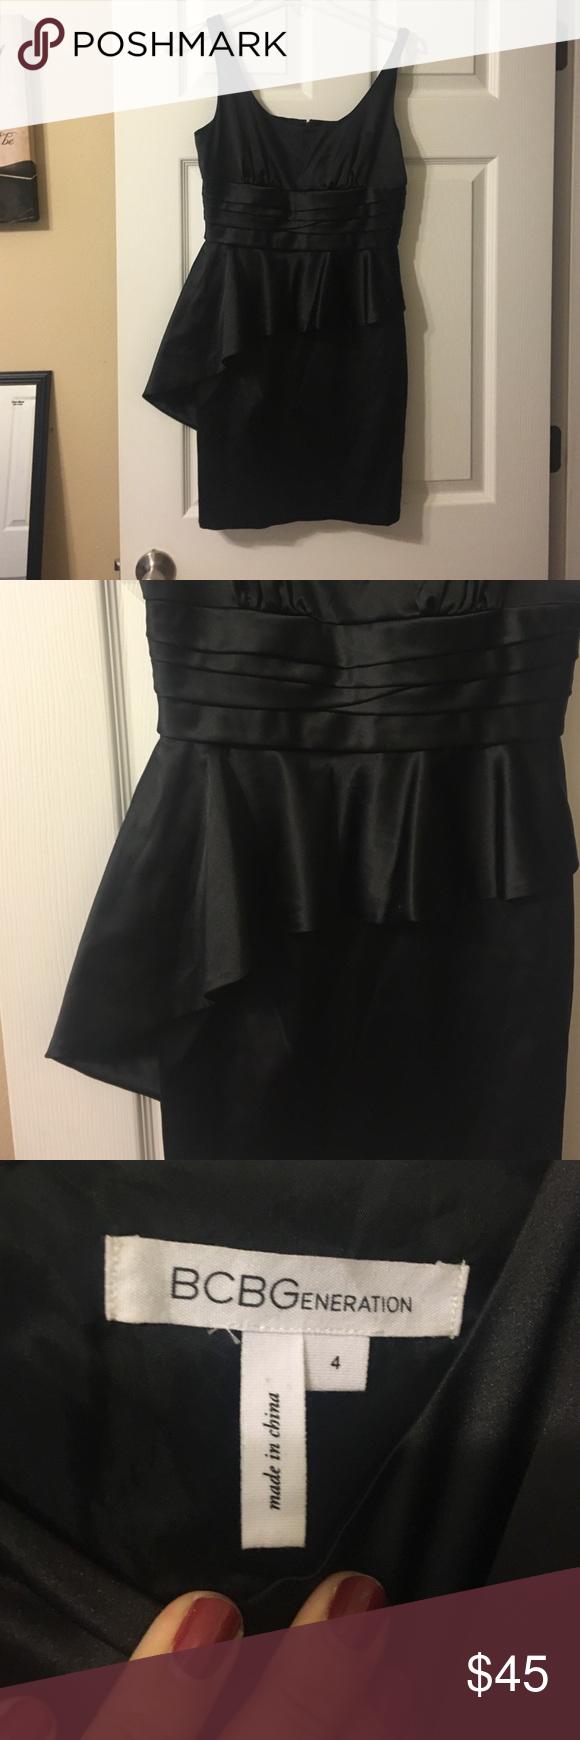 BCBGeneration Asymetrical Peplum Dress Black Satin dress with an asymmetrical peplum from BCBGeneration - size 4. BCBGeneration Dresses